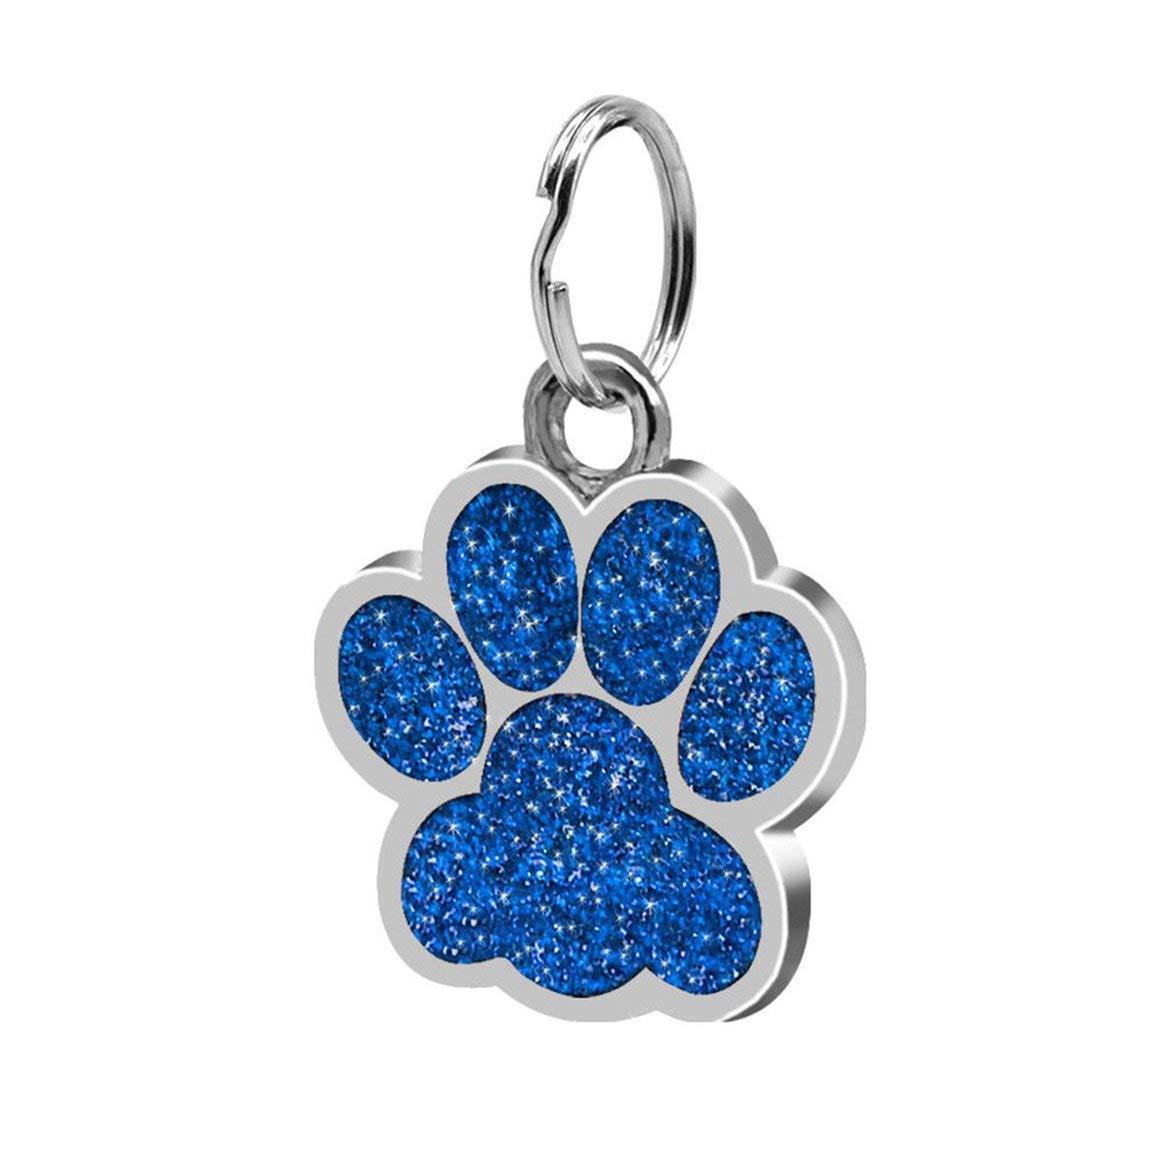 Color: Azul ID Fashion Footprints Pet Colgante Decoraci/ón Lovely Pet Jewelry Popular Glitter Footprint Tarjeta de Identidad Etiqueta de Perro Accesorios para Mascotas